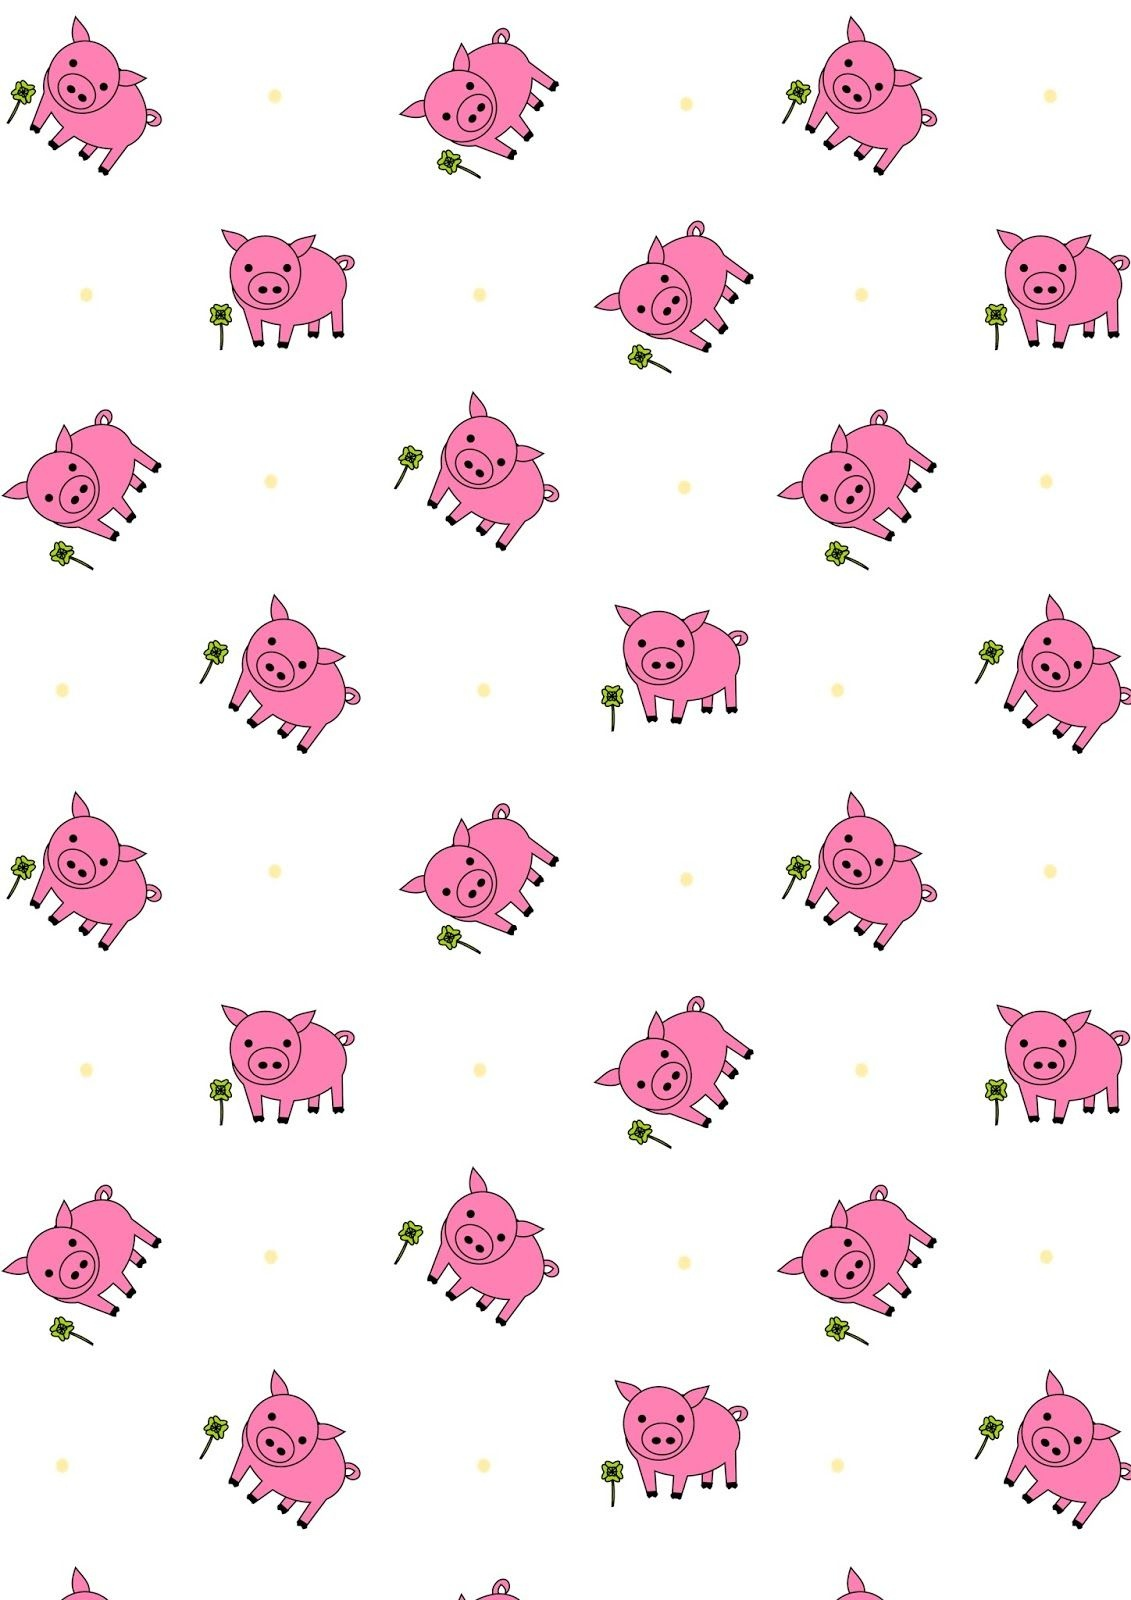 Free Printable Lucky Pig Pattern Paper | Digi Papers Some Free - Free Printable Pattern Paper Sheets